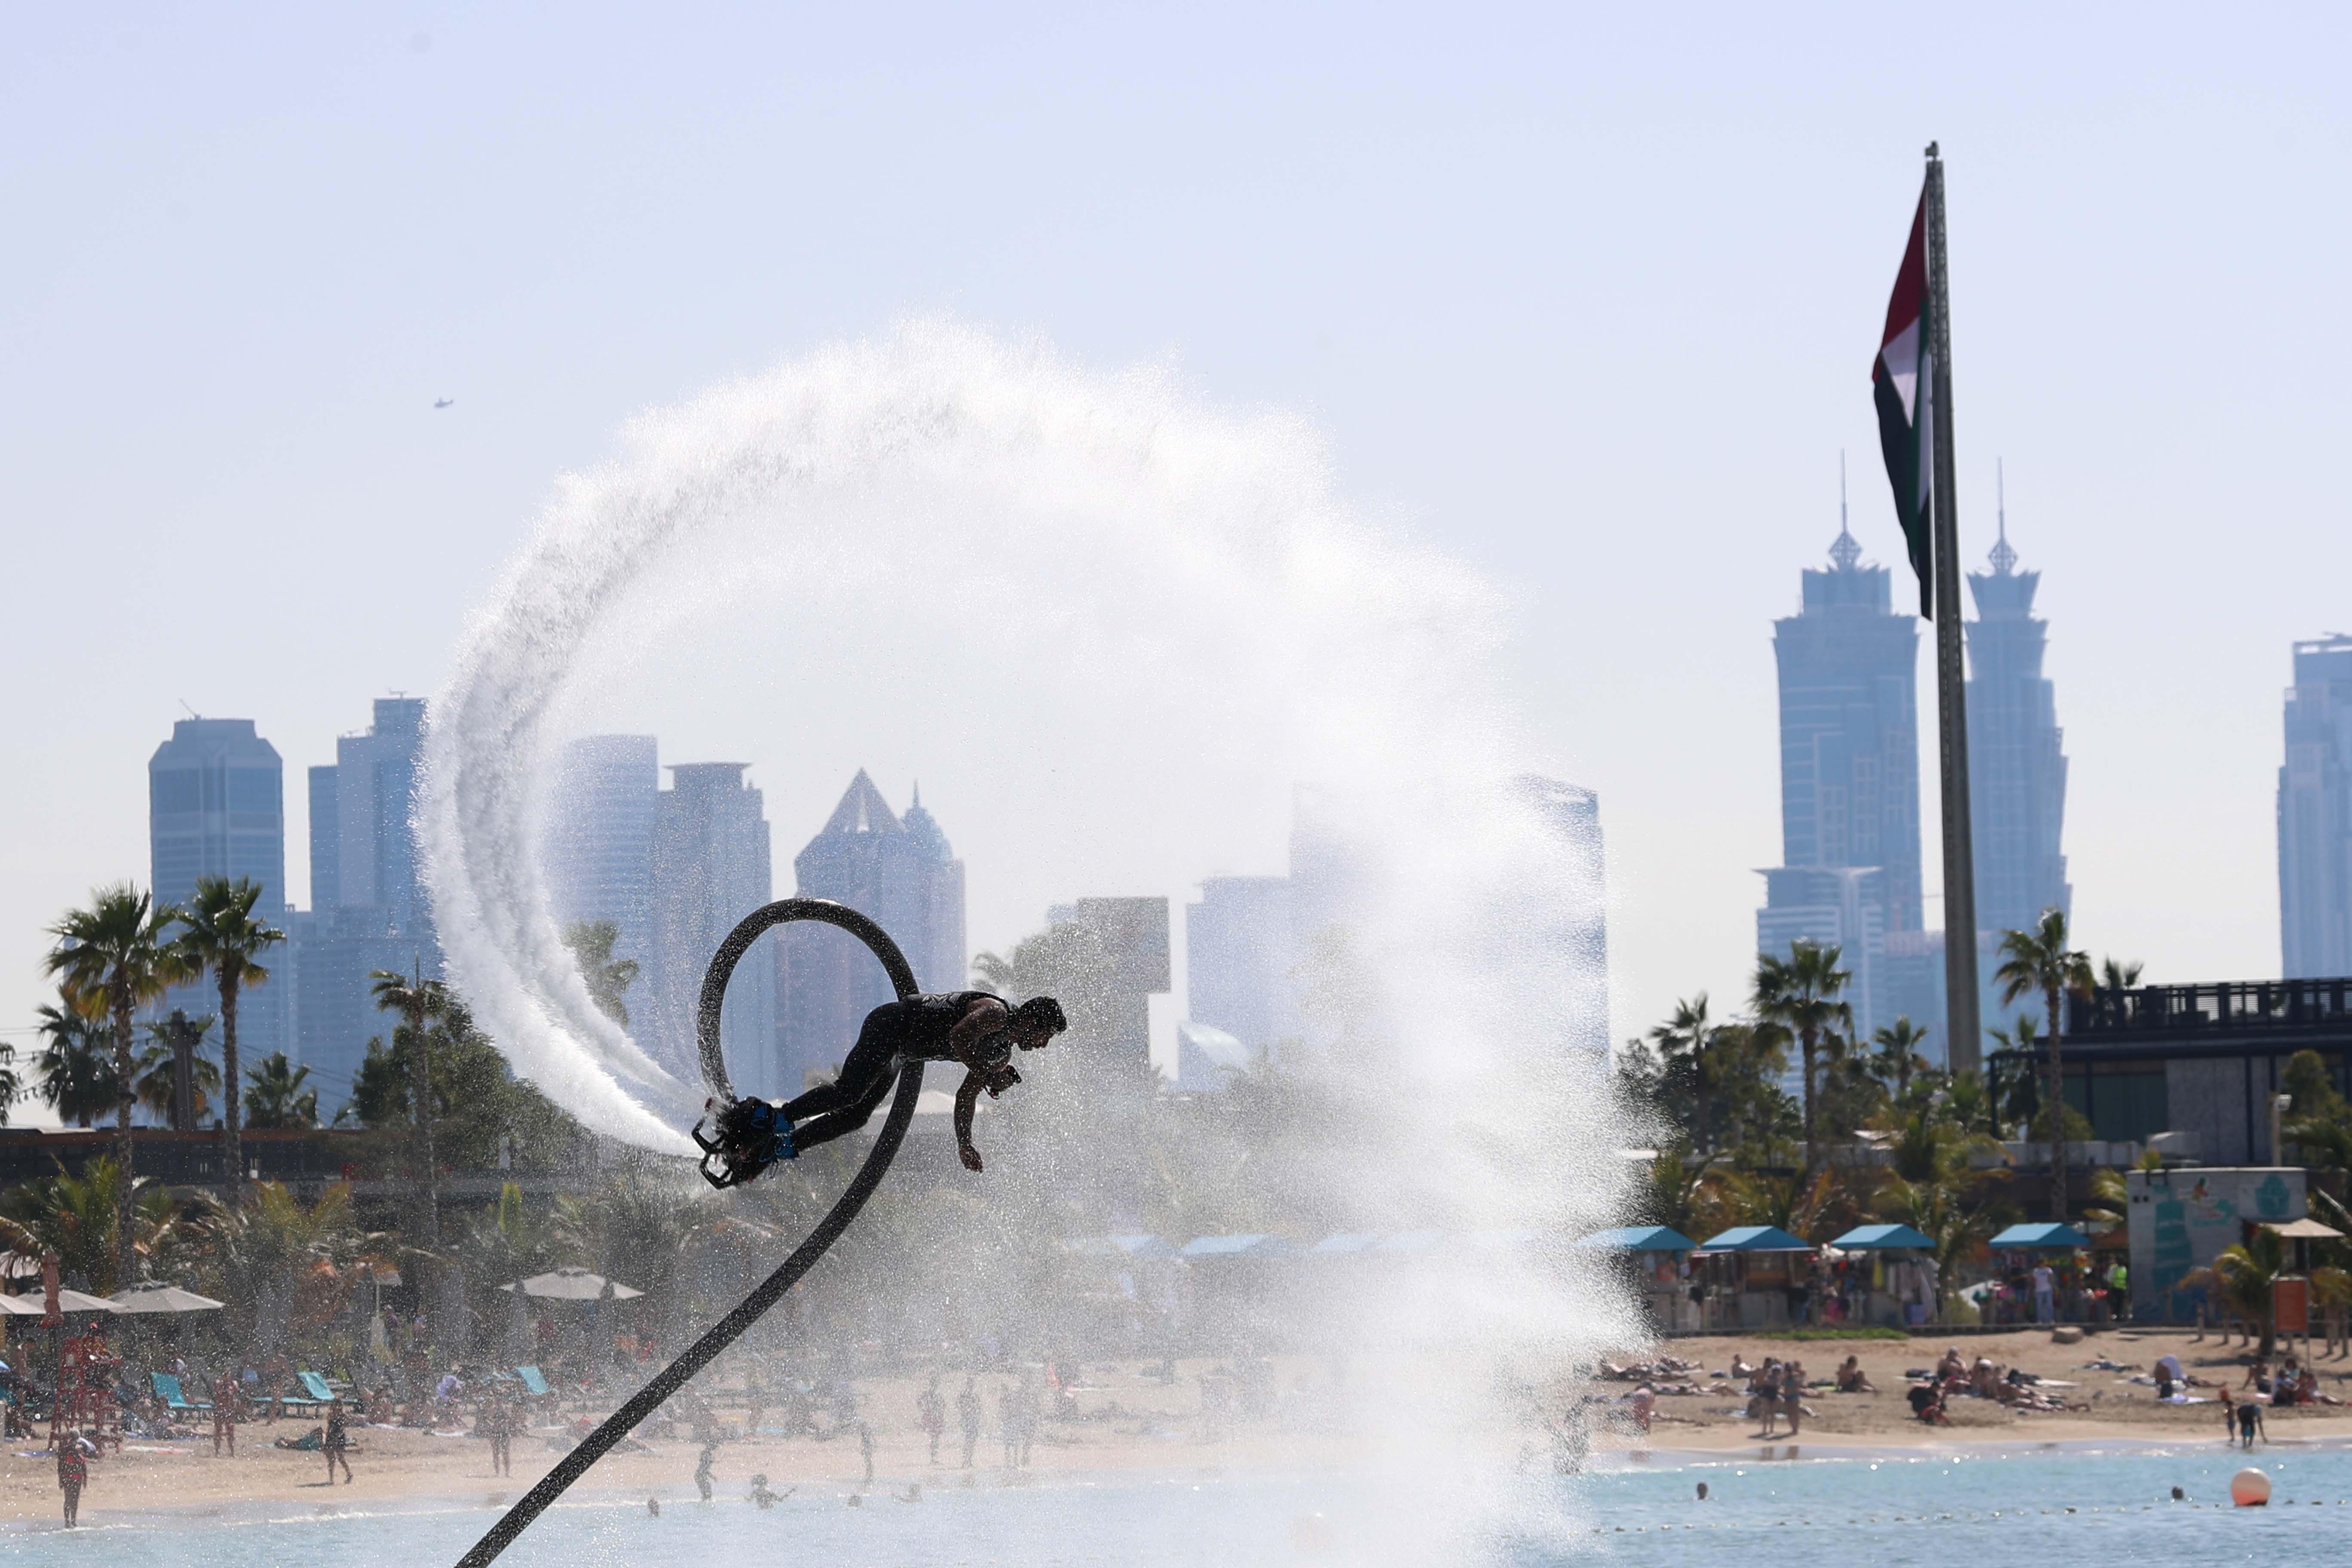 Dubai Water Sports Week starts today at Al Shurooq Beach